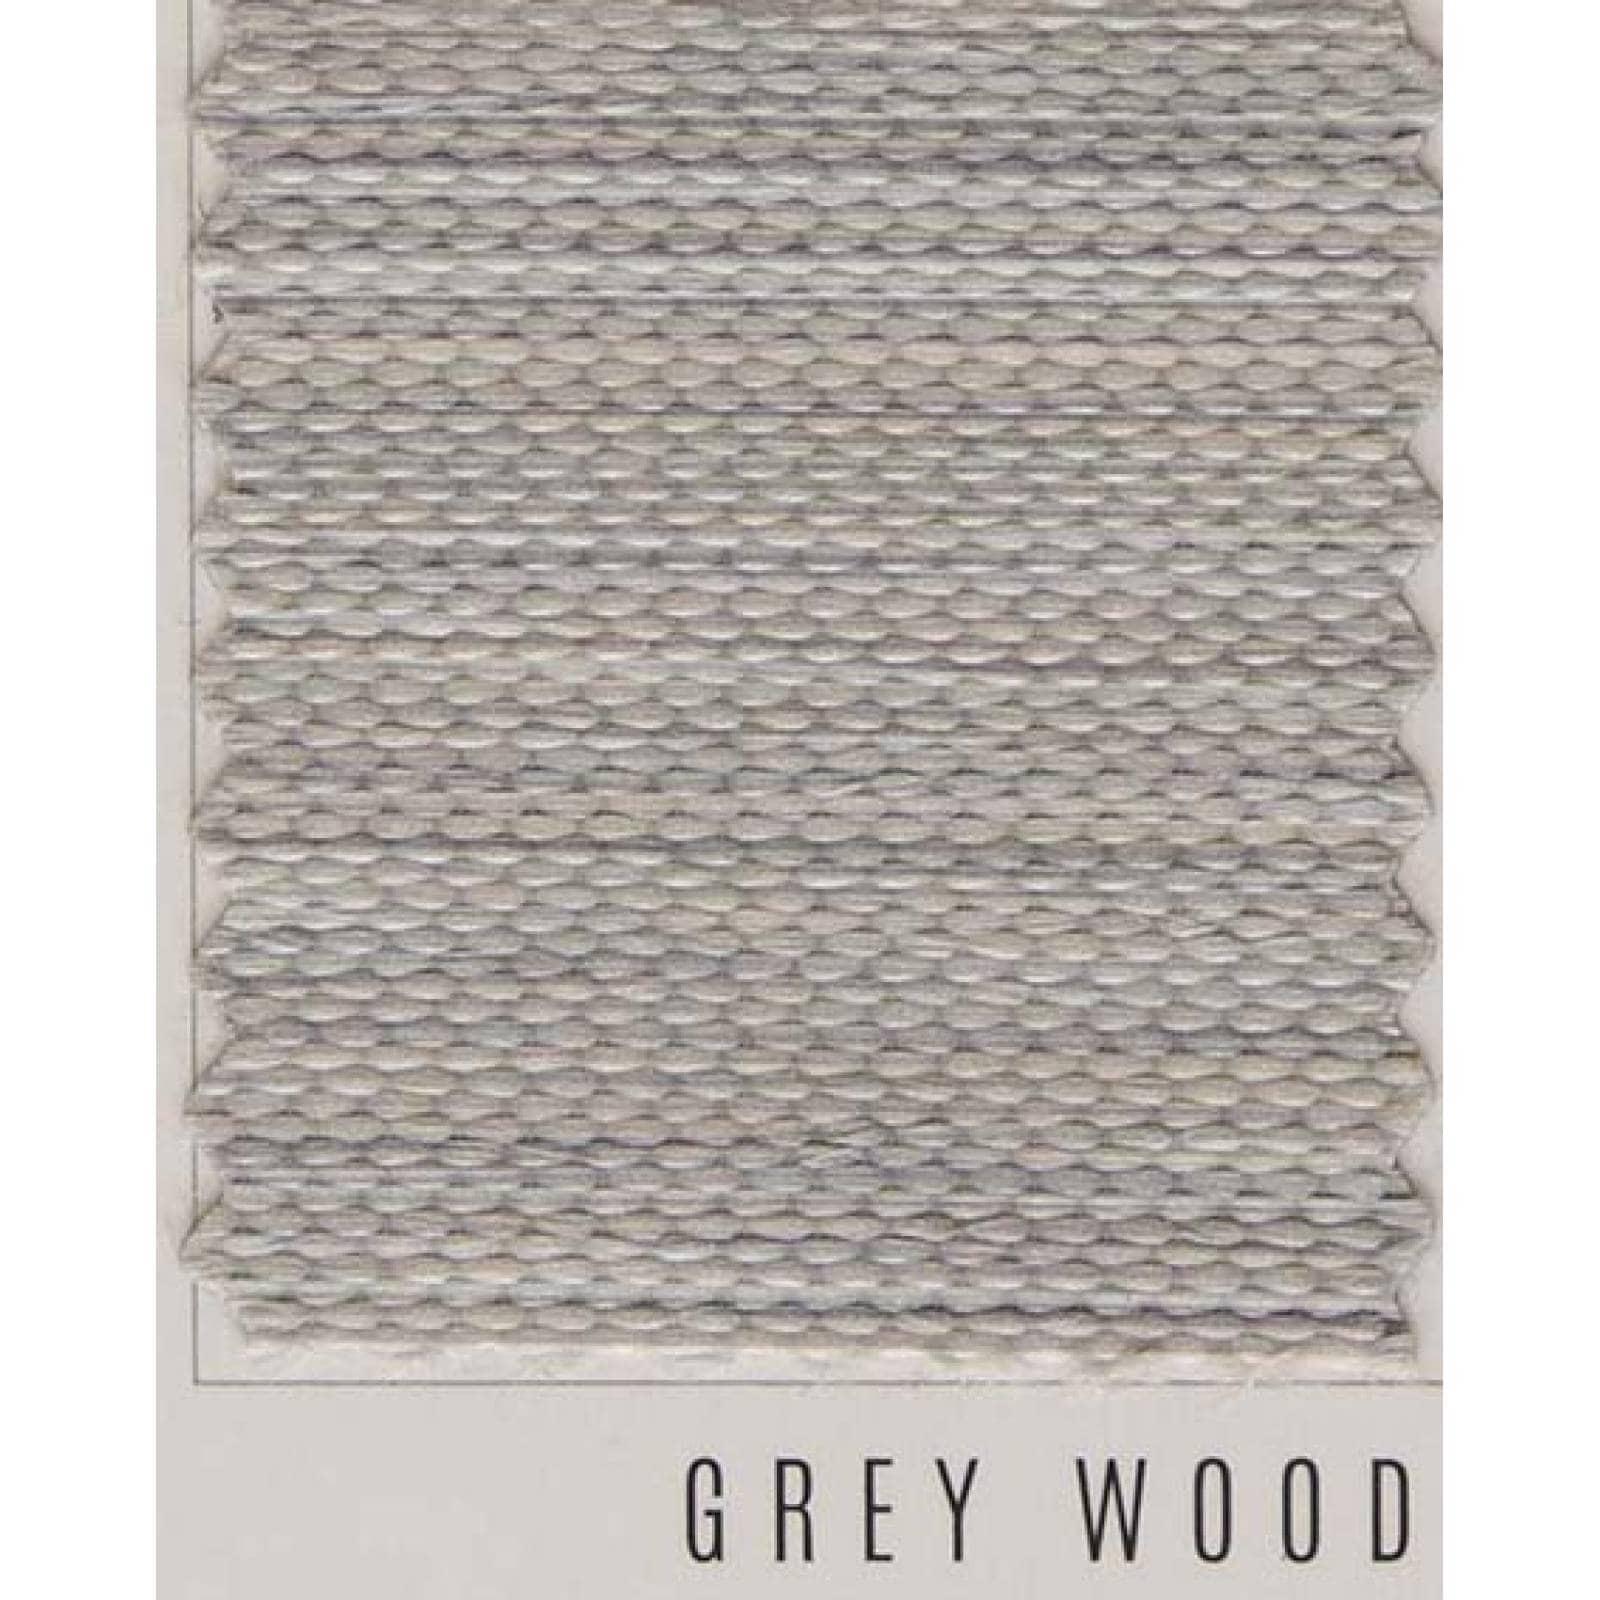 Persianas Sheer Elegance modelo Wood line 150 cm de ancho X hasta 230 cm de largo